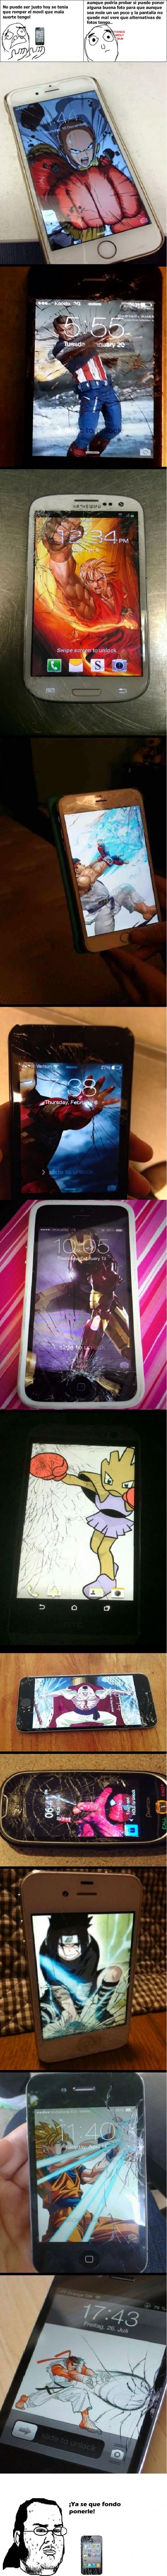 Friki - Si se te rompe la pantalla del móvil, ¡ya sabes qué hacer!